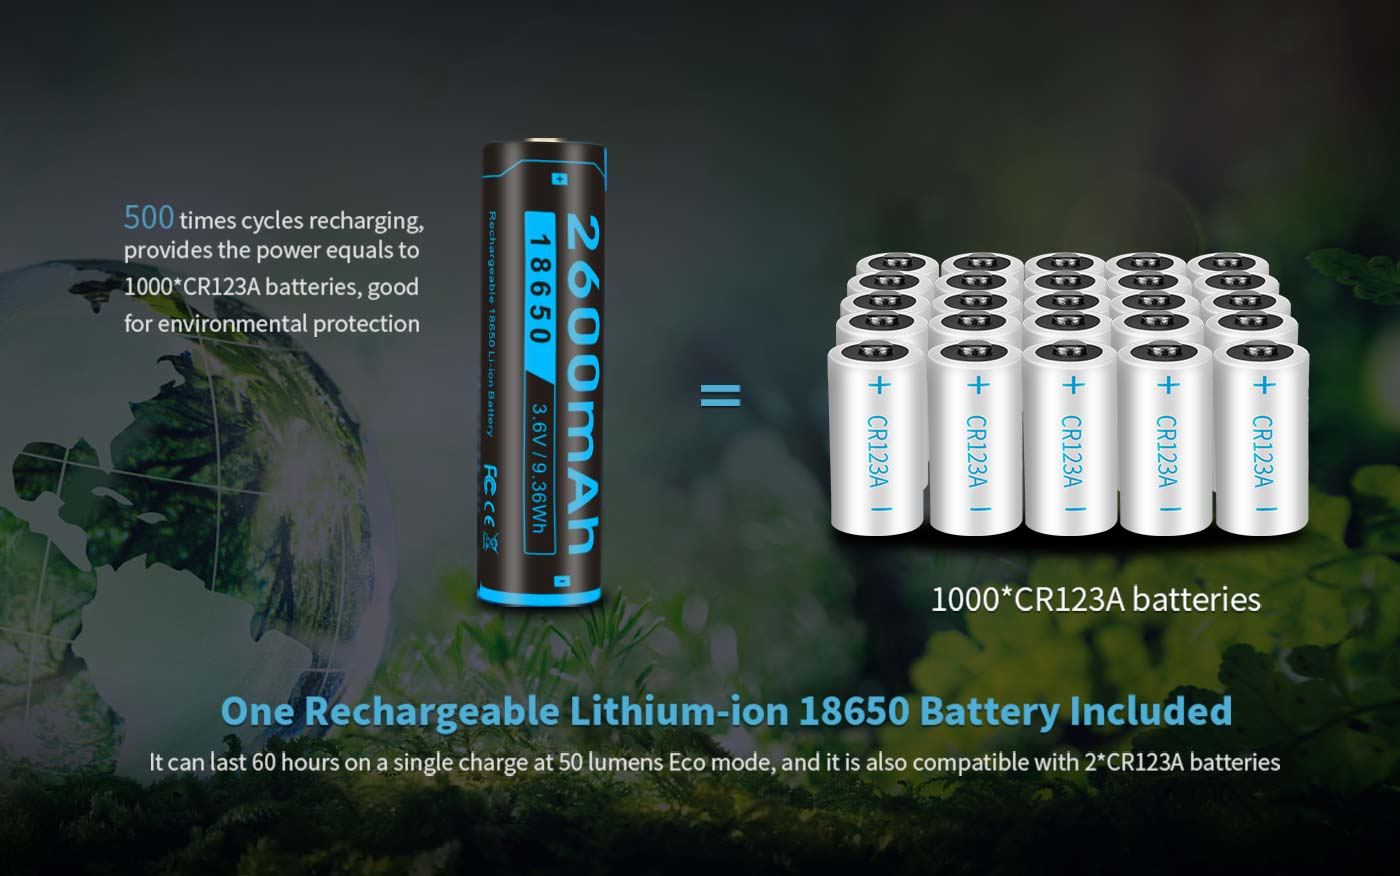 high capacity battery headlamp, led headtorch, headlamp rechargeable